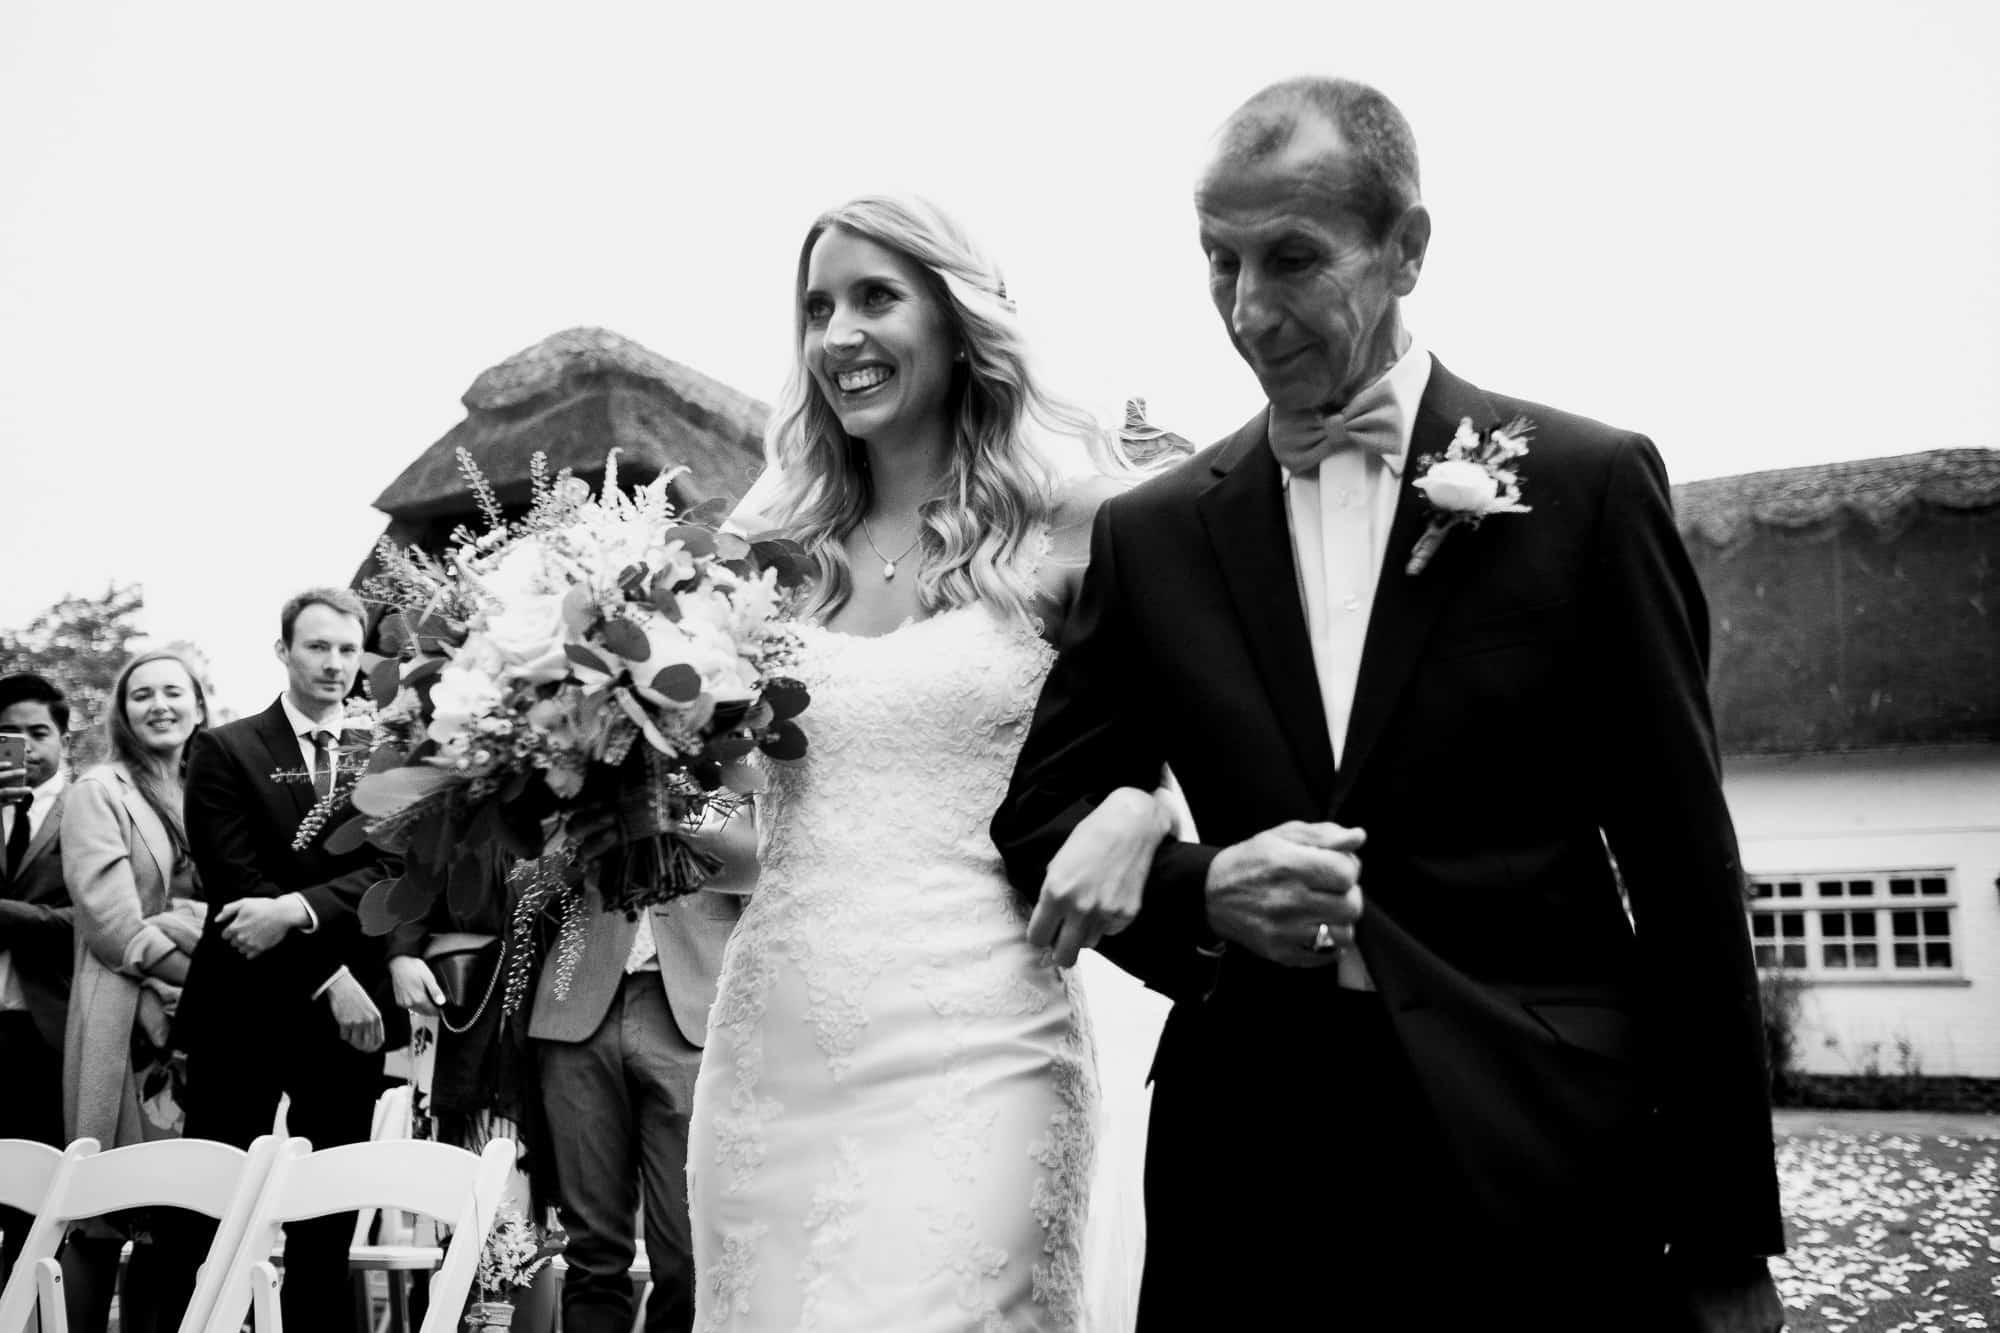 marleybrook-house-wedding-photography-matt-tyler-0025